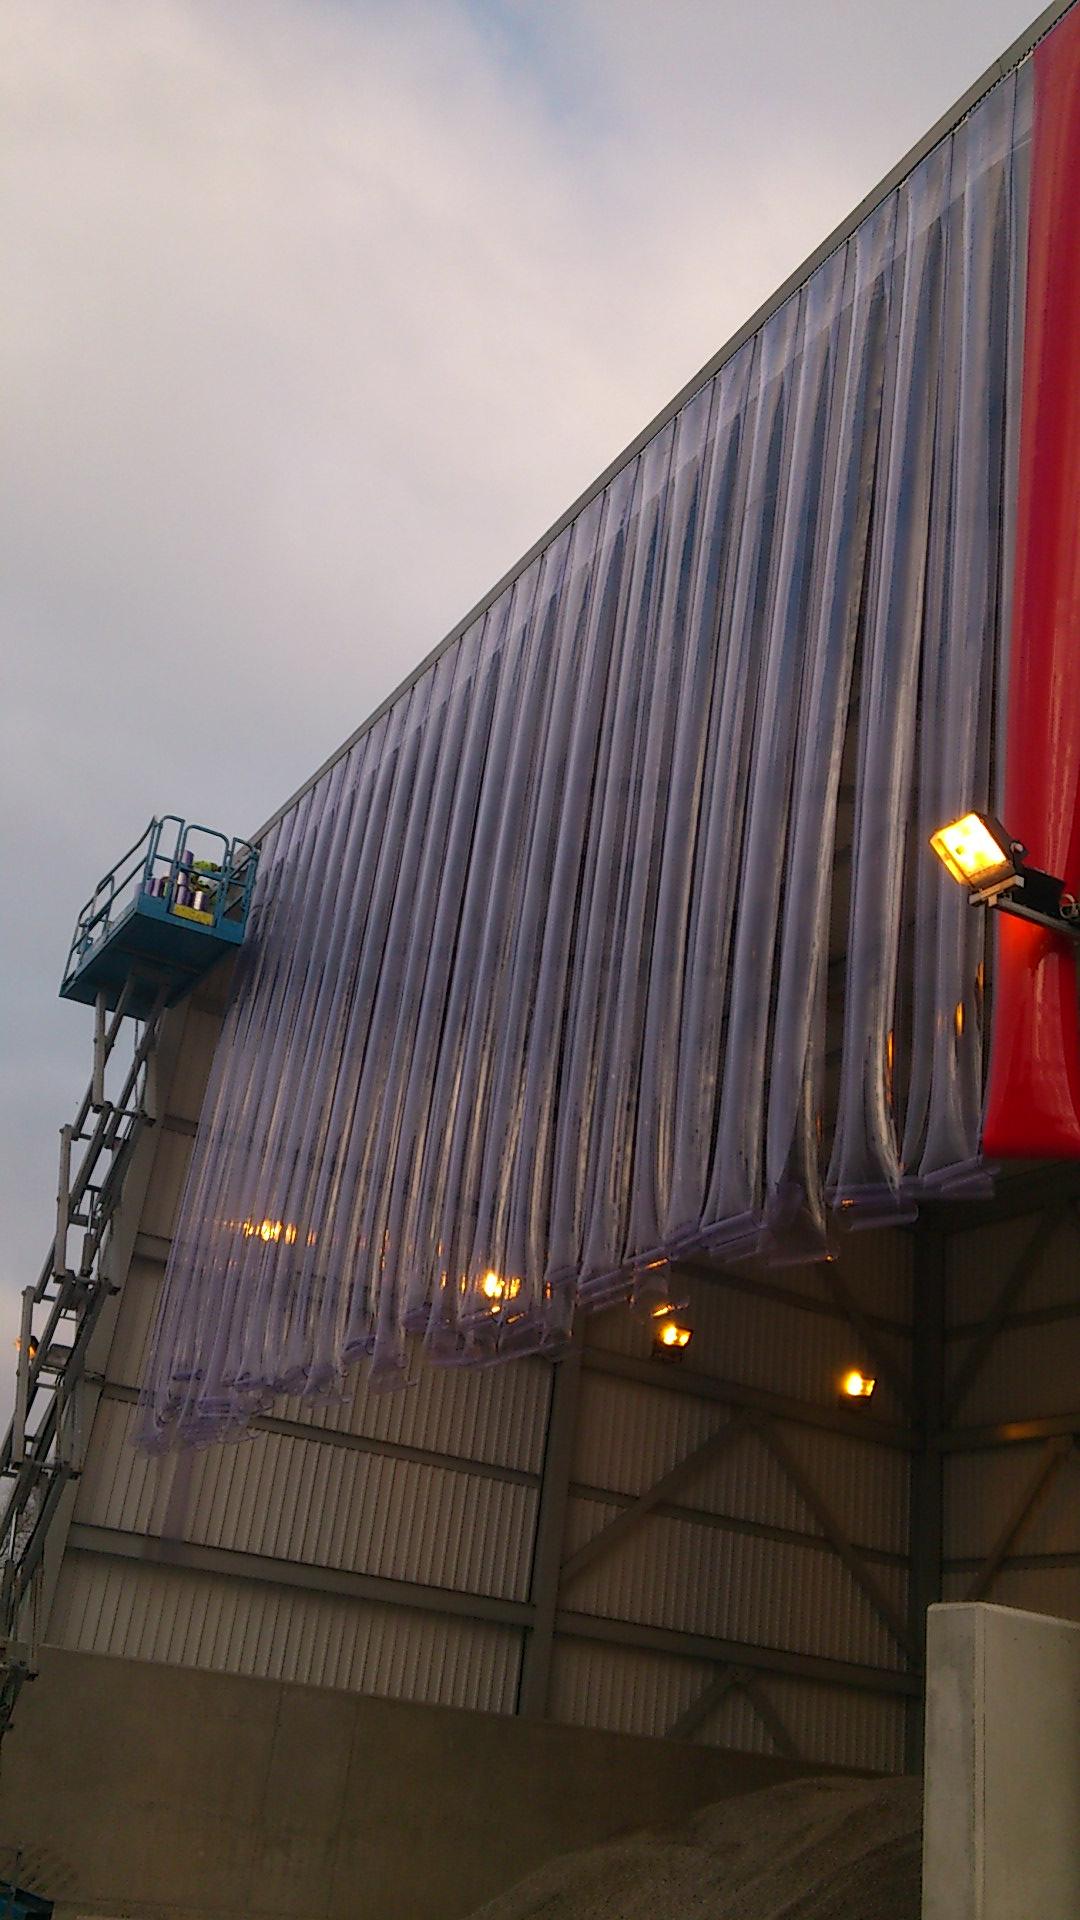 curtain fly mesh bird strip screens pvs droppings and curtaincloseupview control curtains pvc